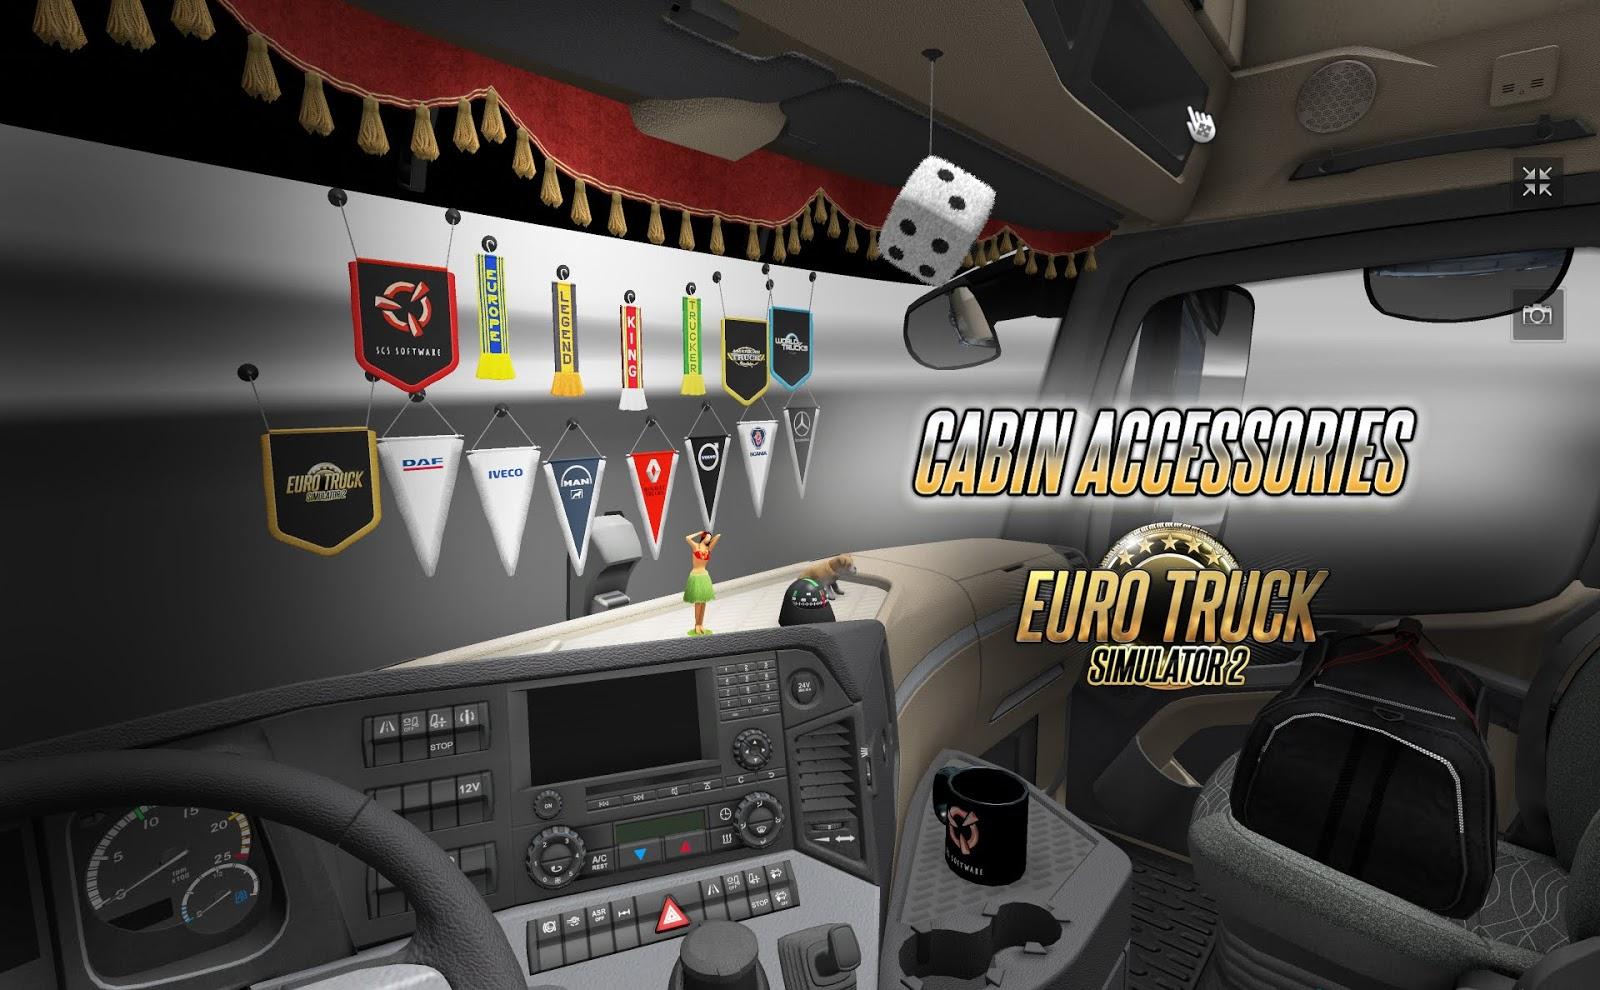 Euro truck simulator 2 keygen